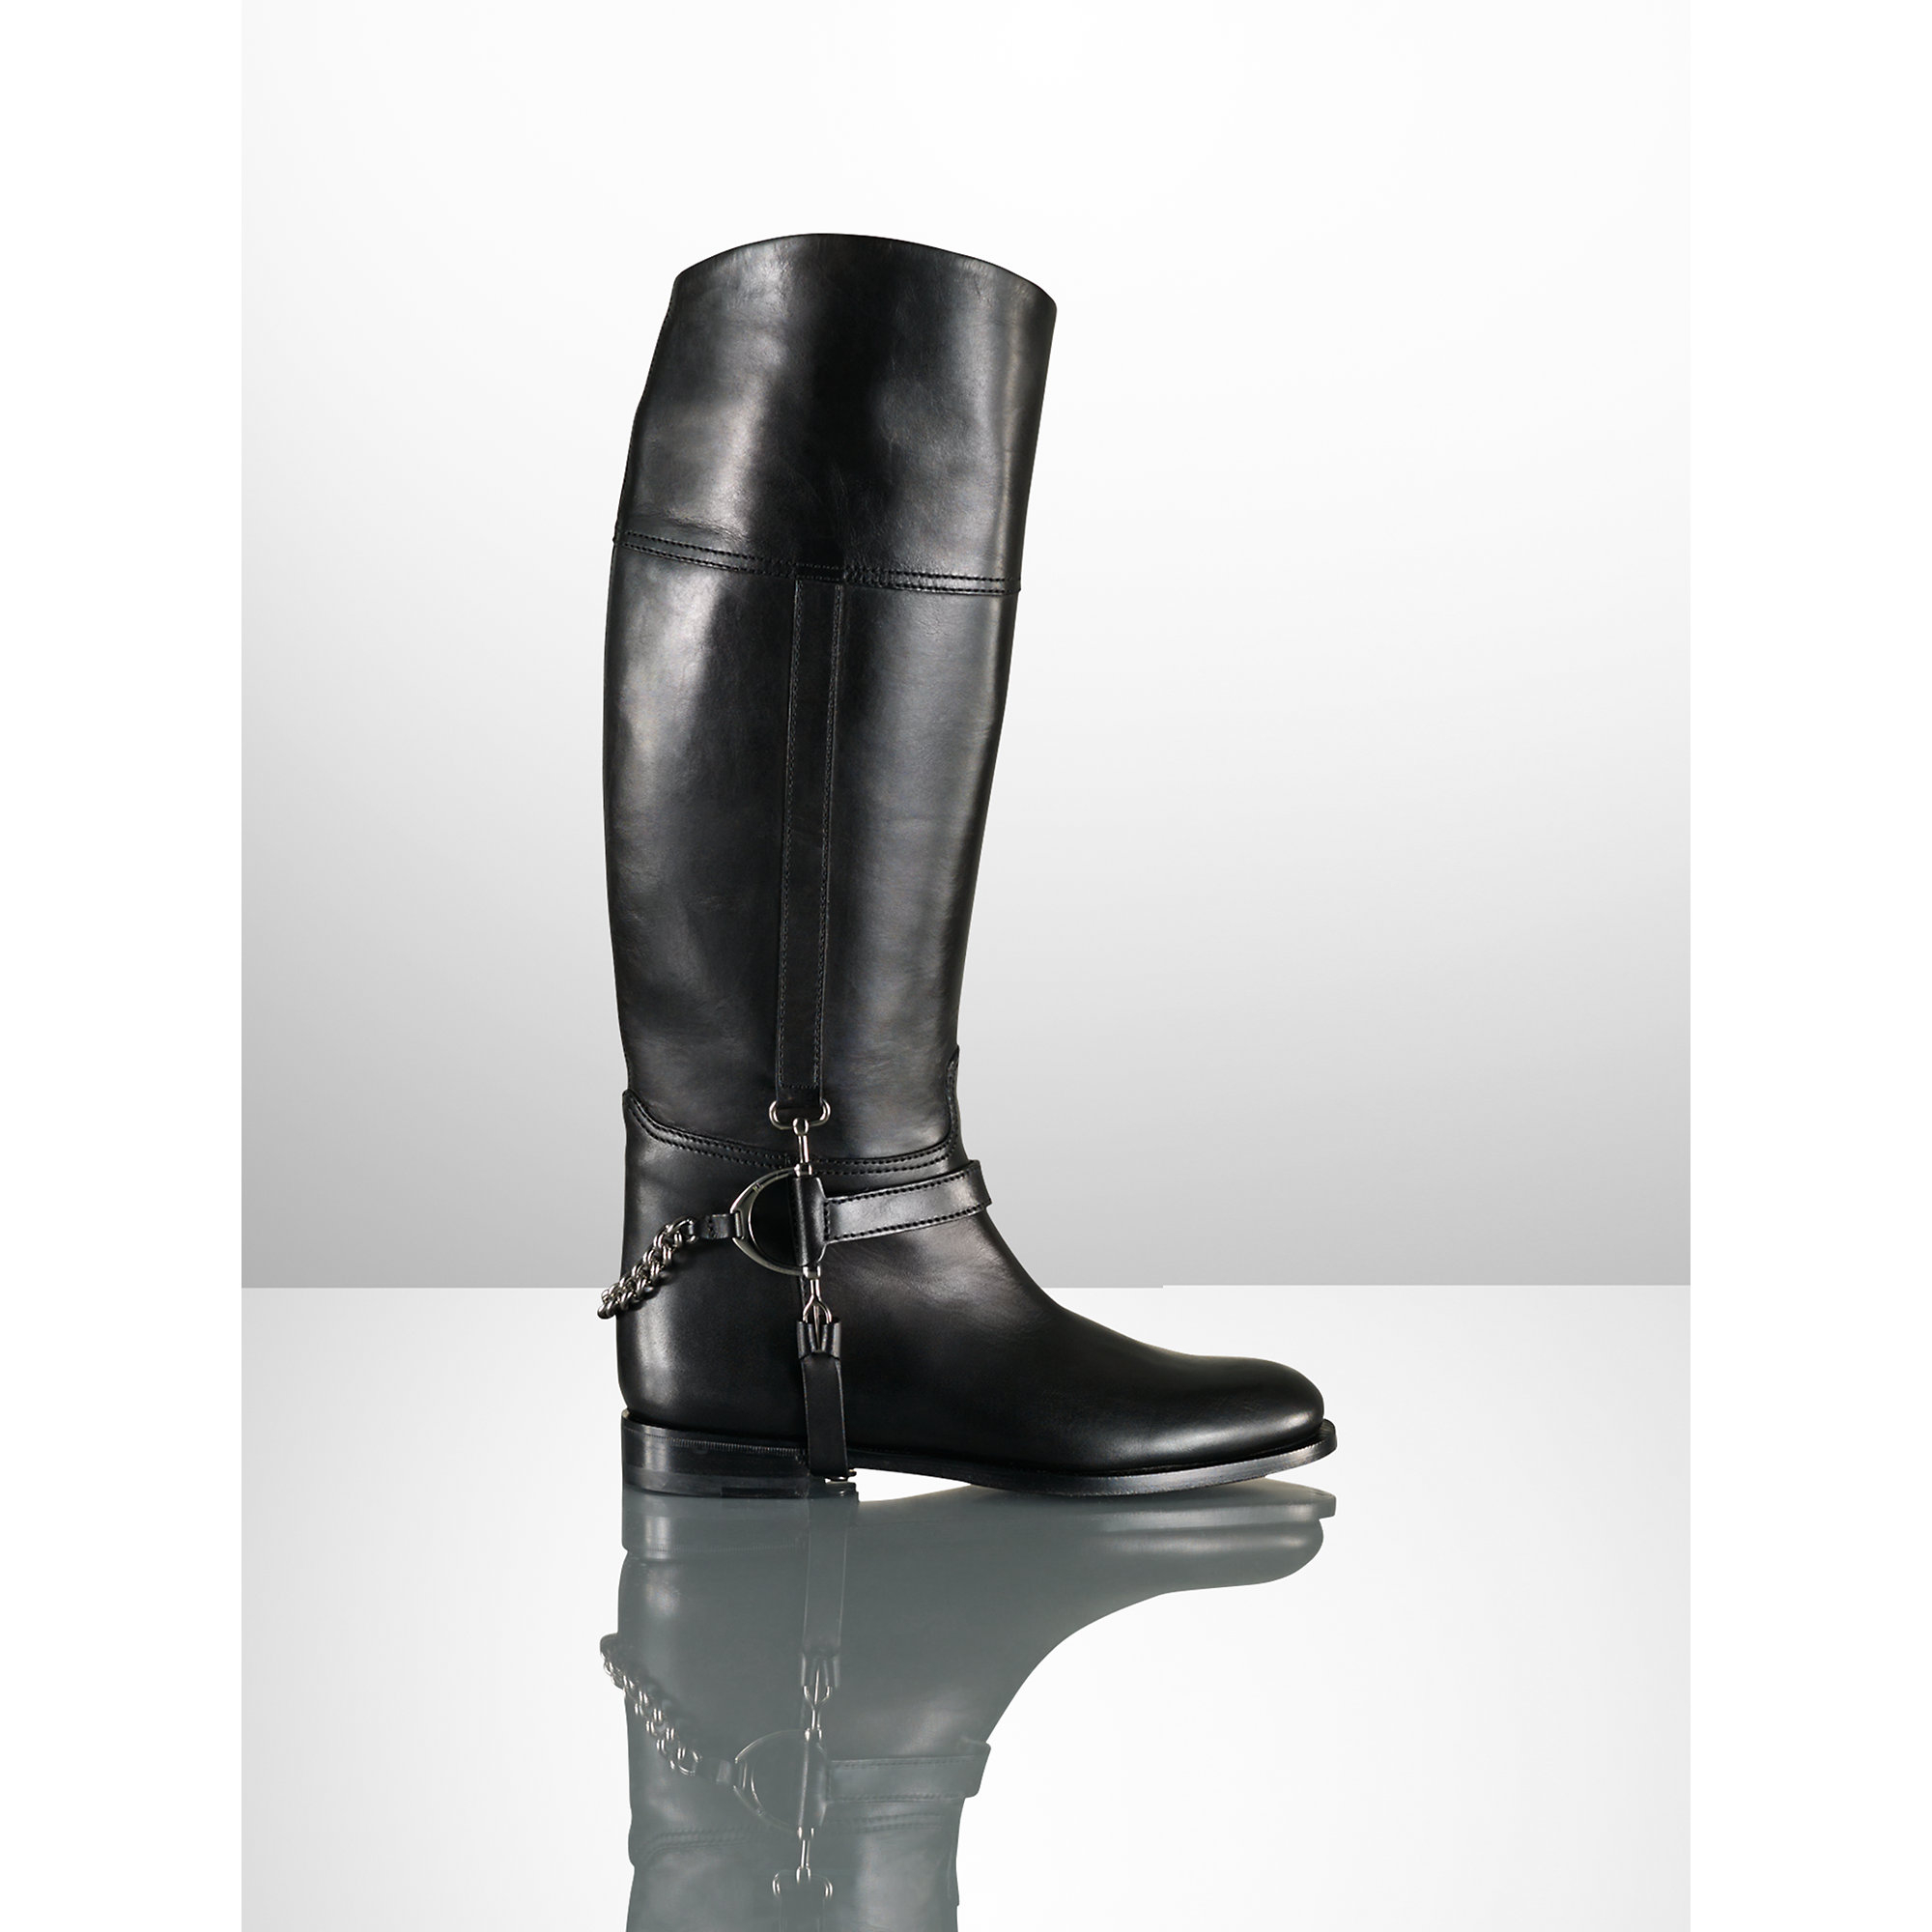 Lyst - Ralph Lauren Calf Chain Sandra Riding Boot in Black